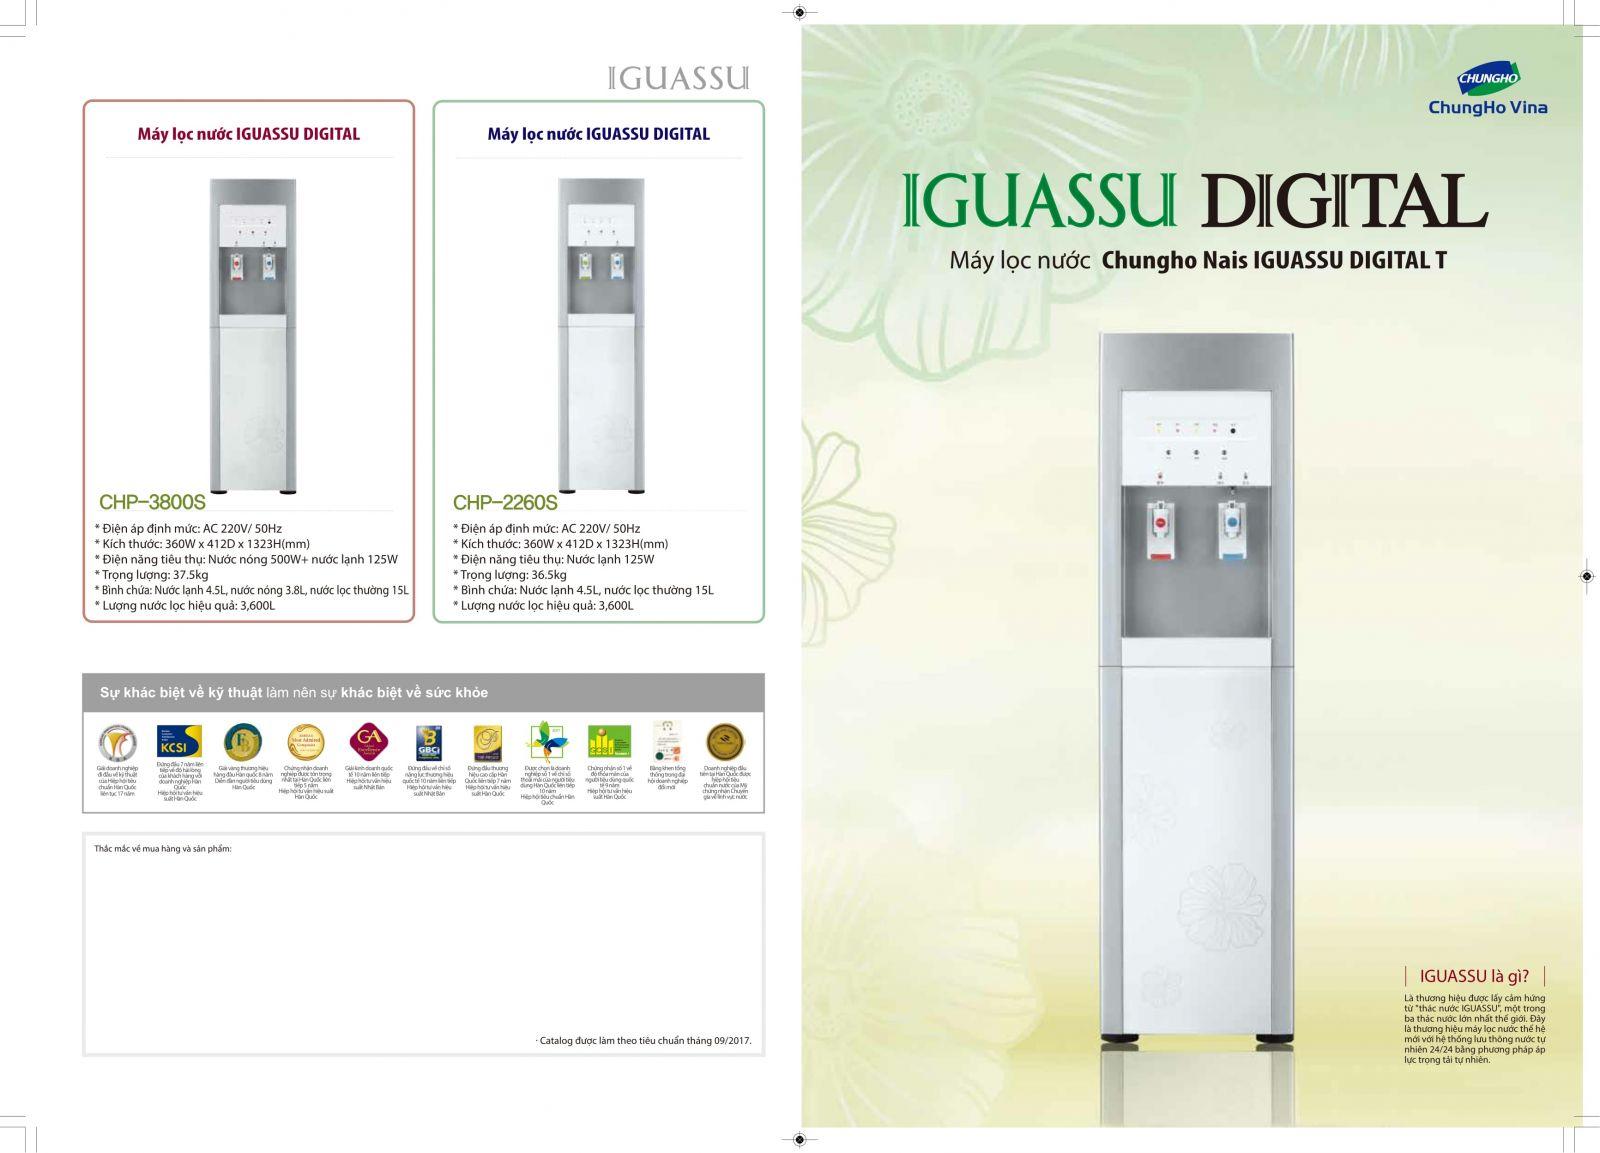 Tổng quan máy lọc Iguassu Digital